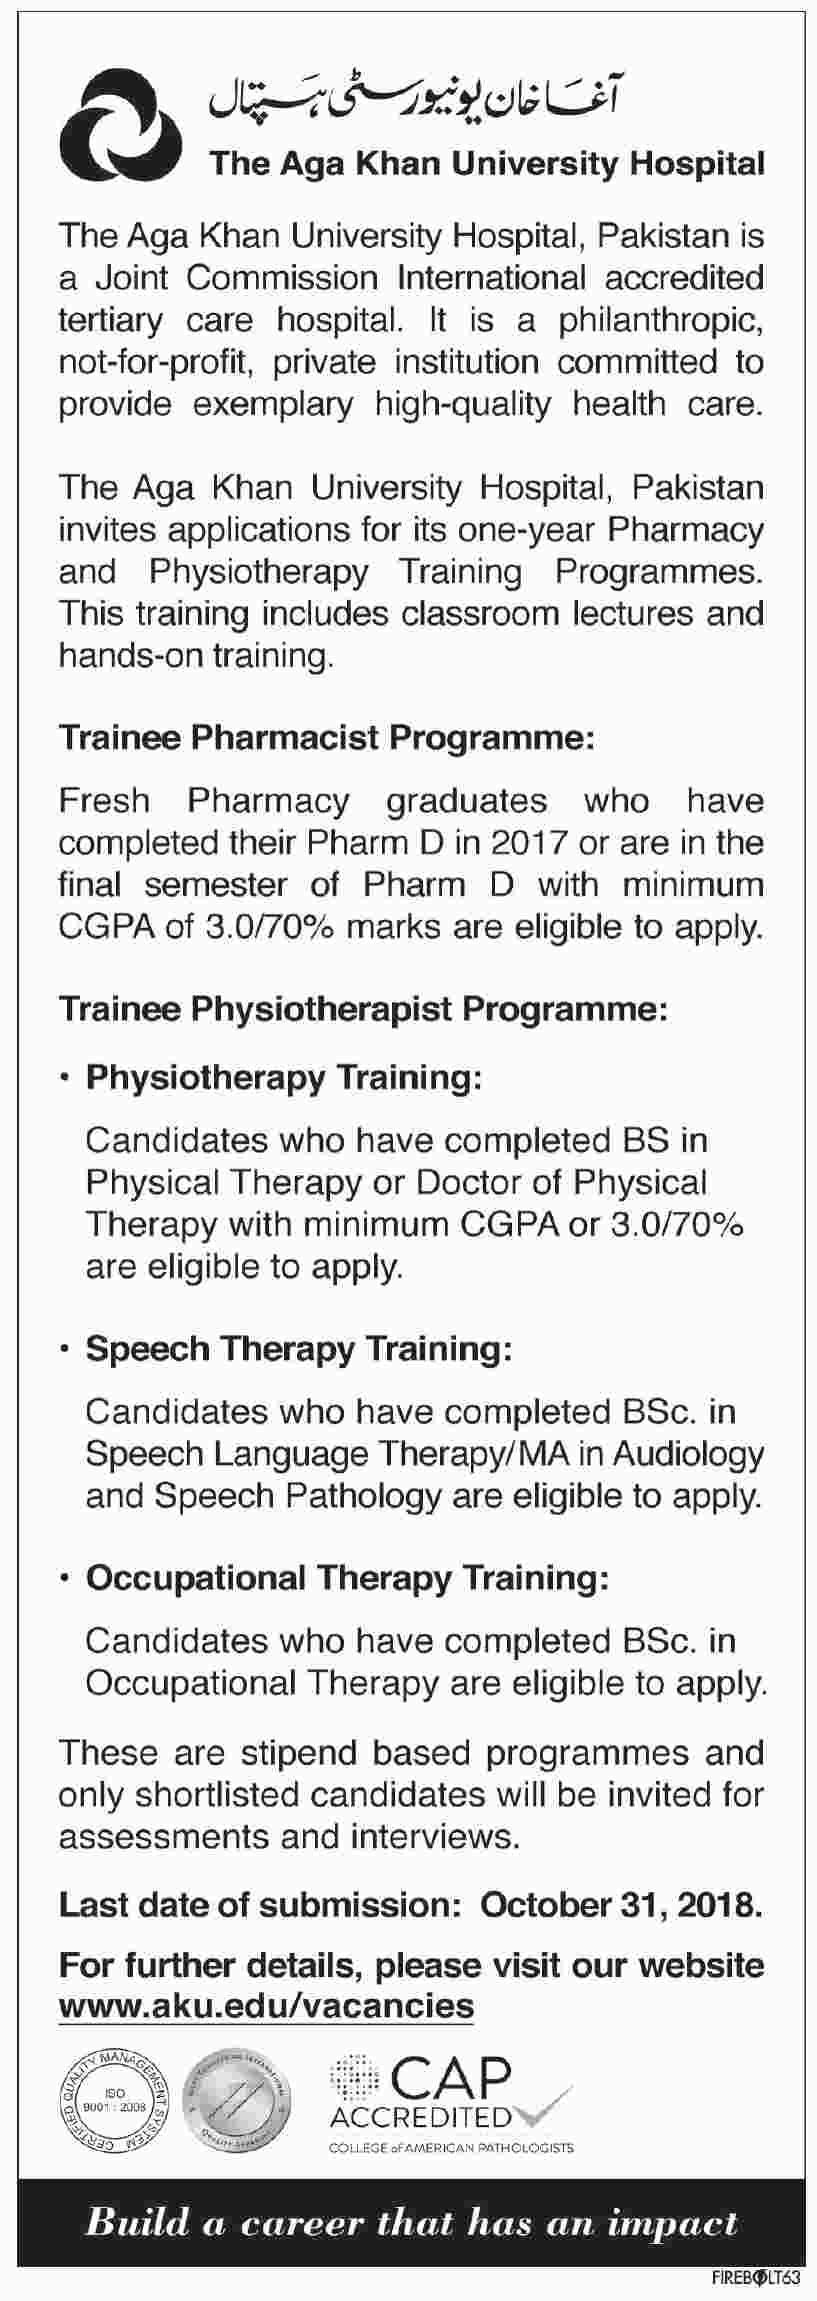 The Aga Khan University Hospital Job Opportunity - Jobs